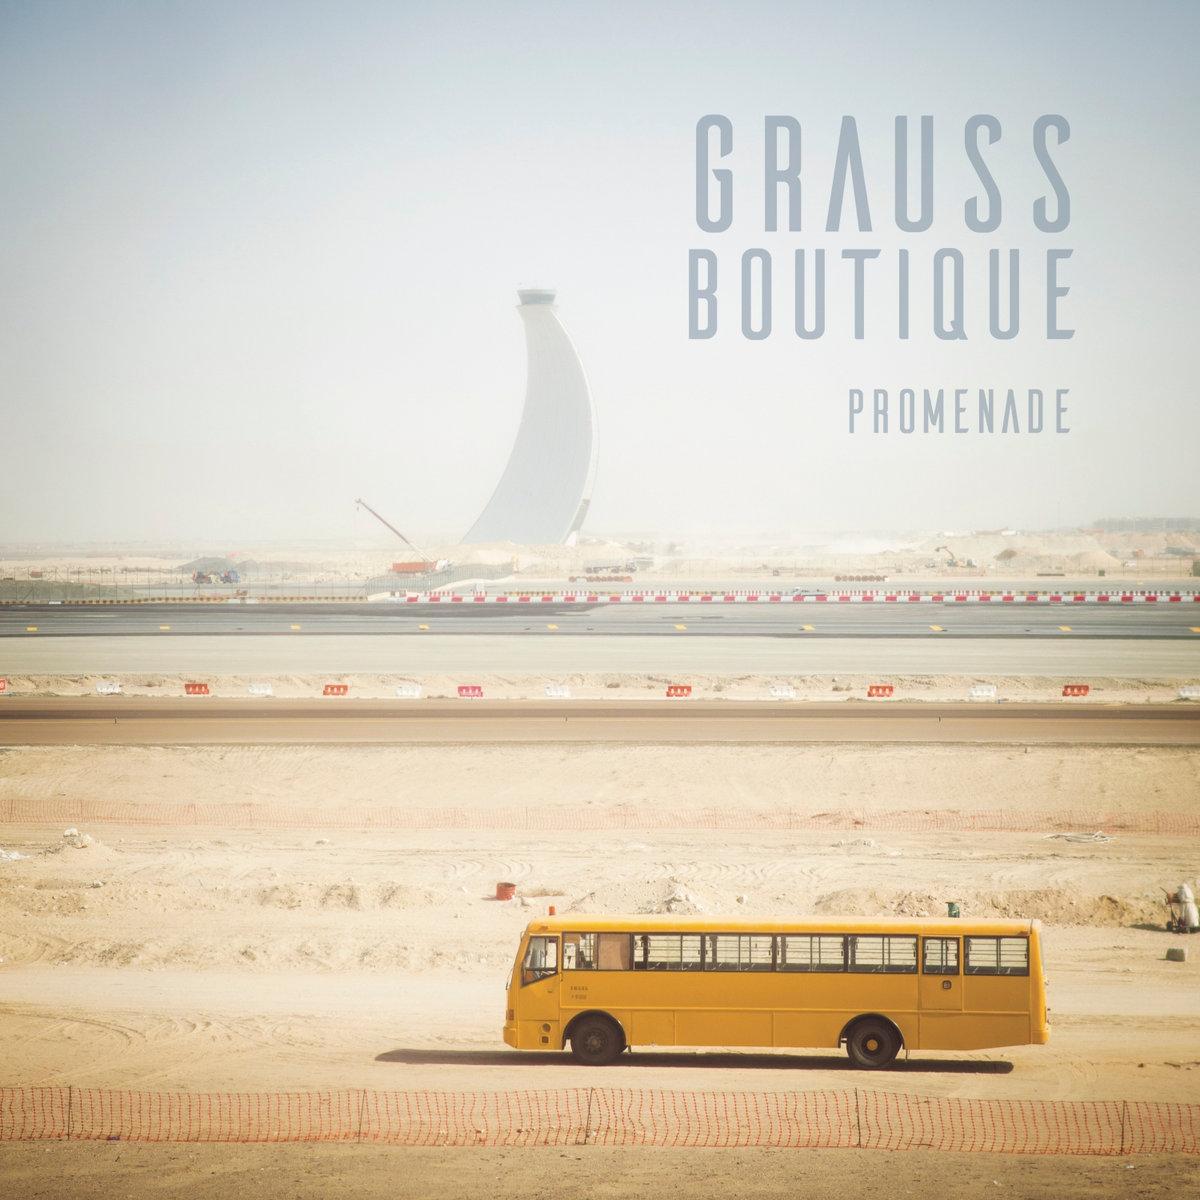 GRAUSS BOUTIQUE - Promenade